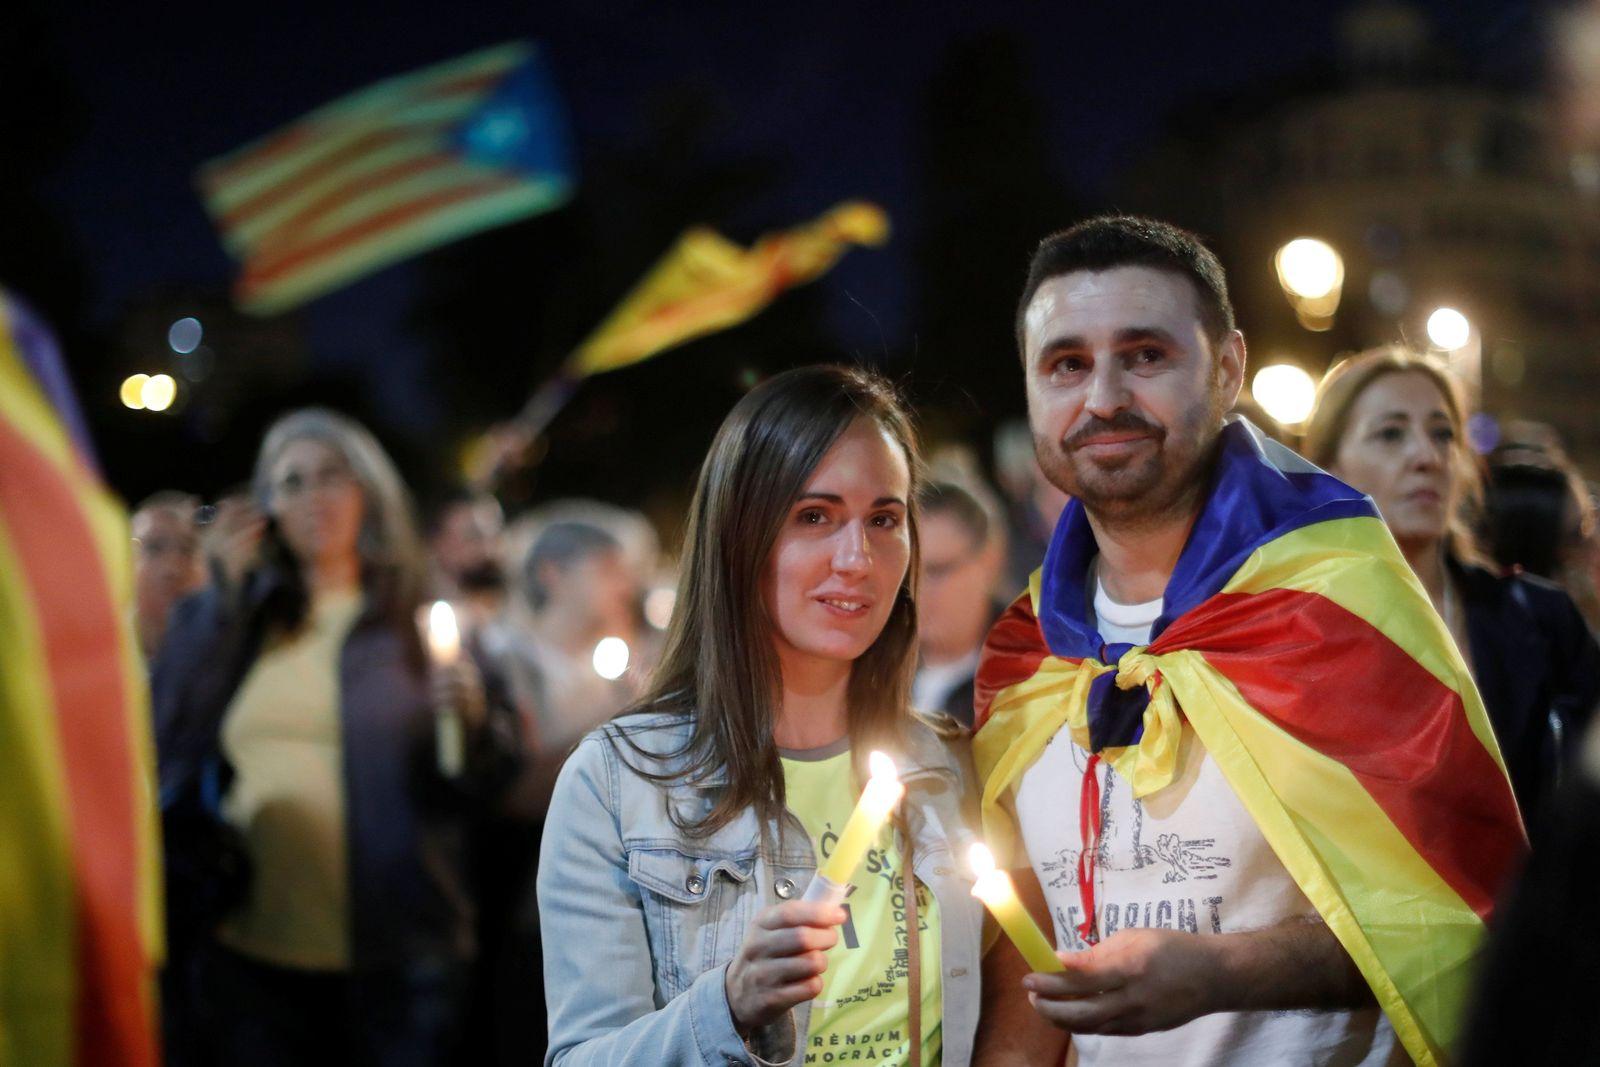 SPAIN-POLITICS/CATALONIA-ARRESTS